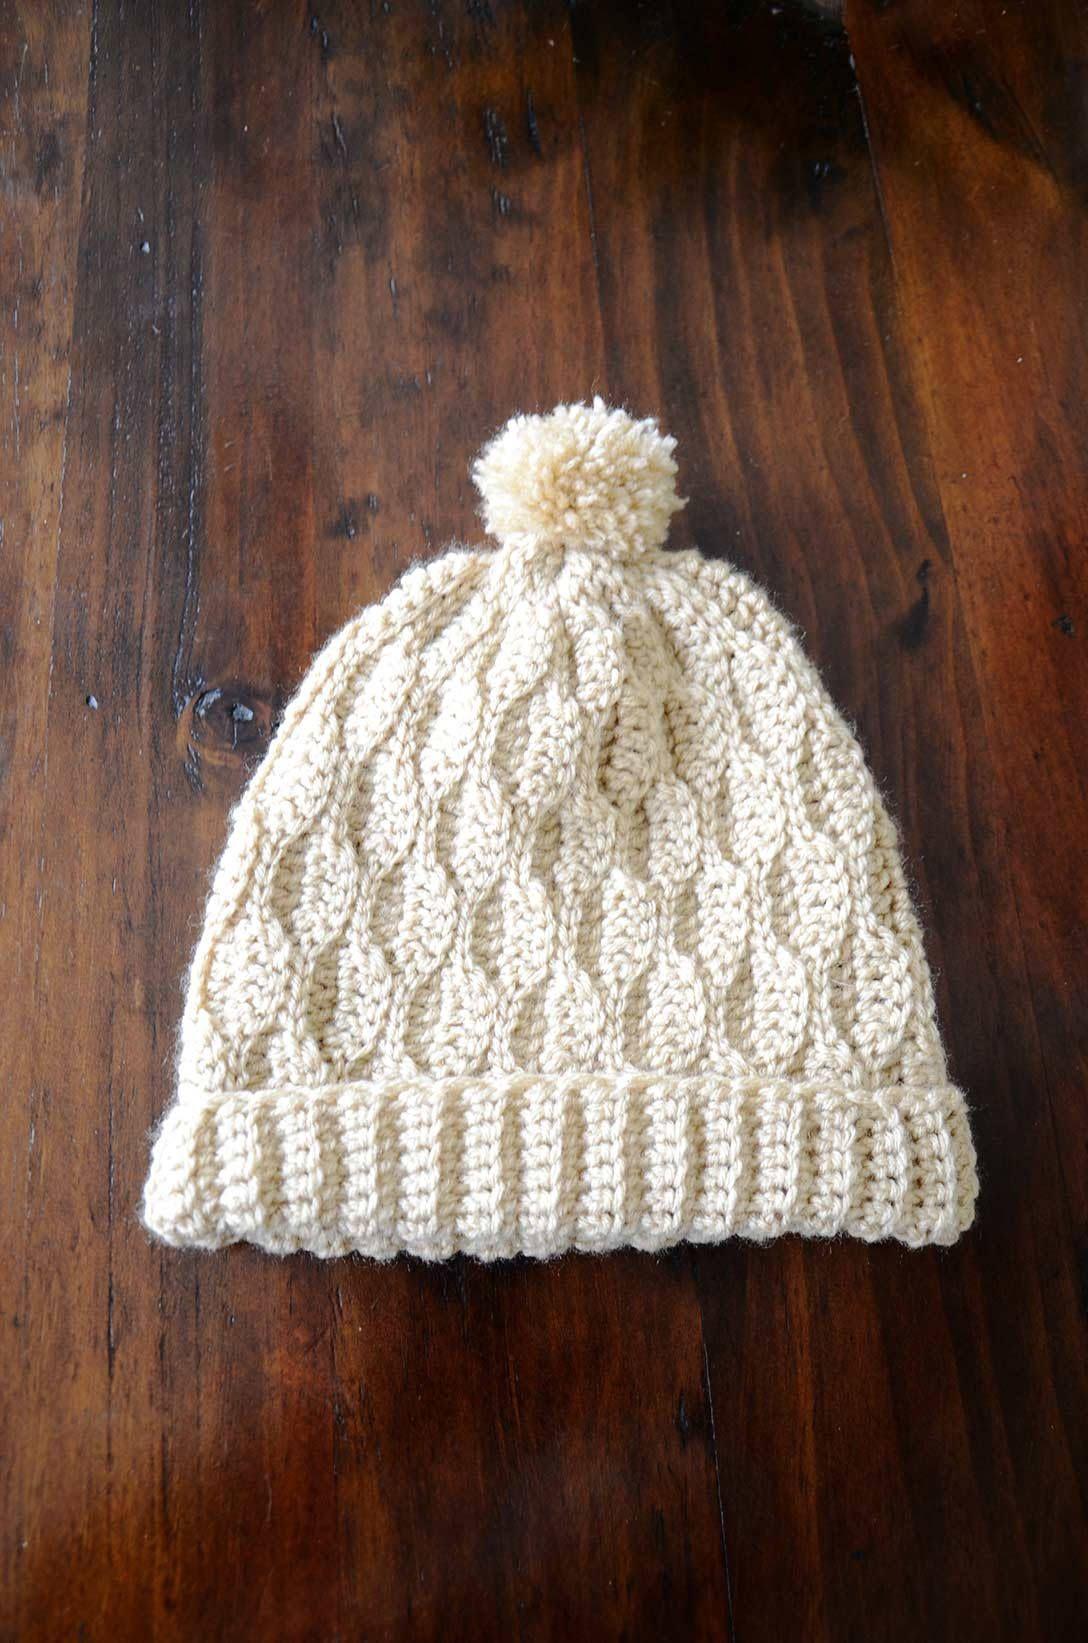 81172e36829 Crochet Hat Pattern The Wave Beanie